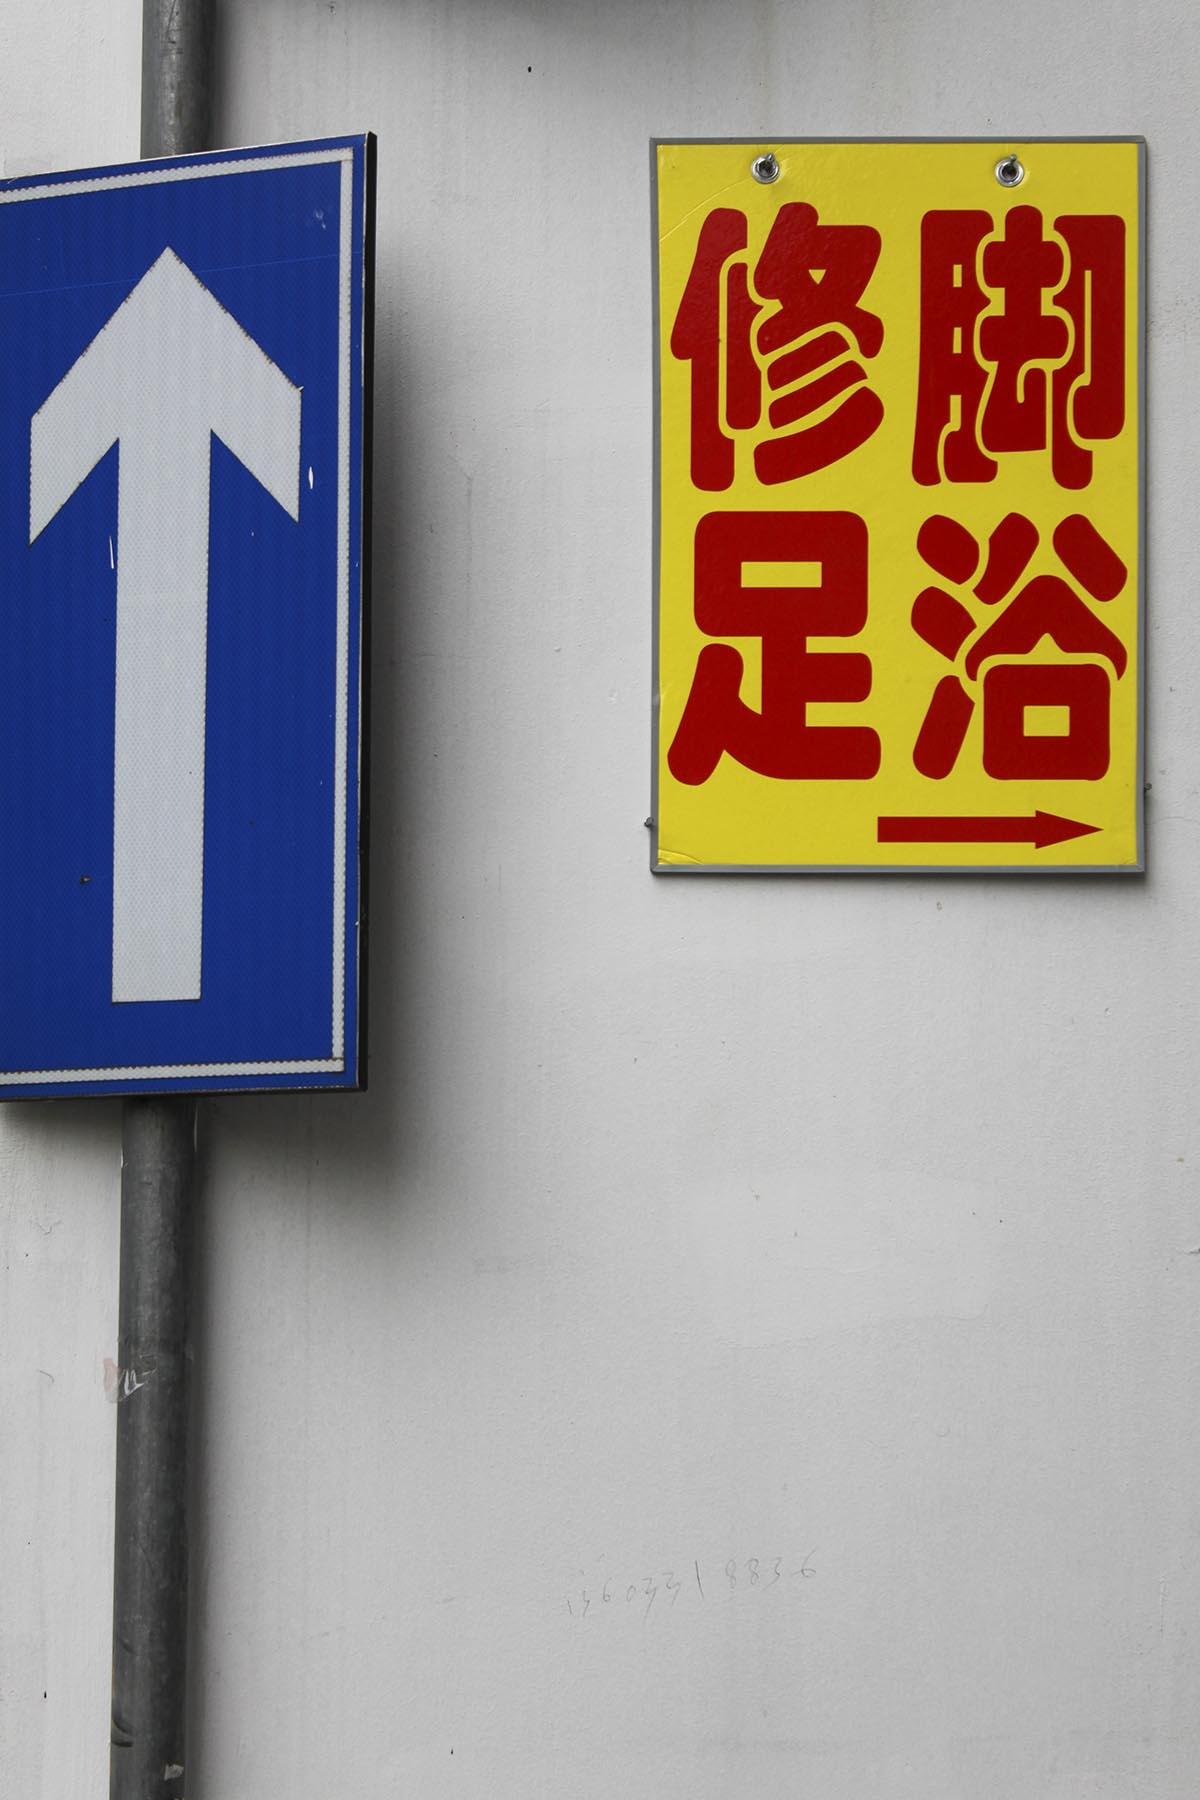 China 09 BANKTM @bank_graphic_design_today lo